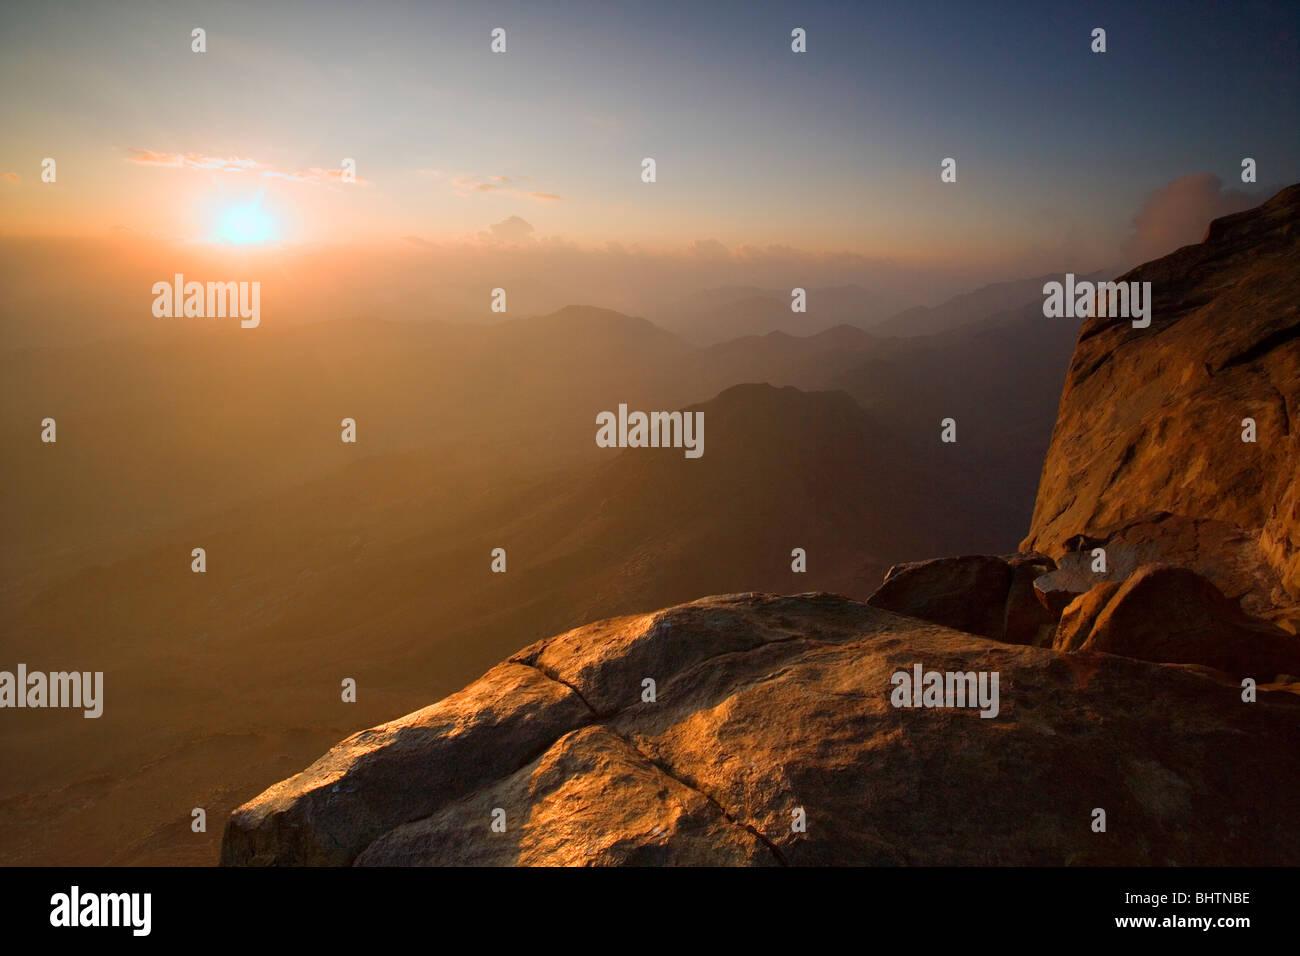 Sunrise viewed from the summit of Mount Sinai, Saint Katherine, Egypt. - Stock Image